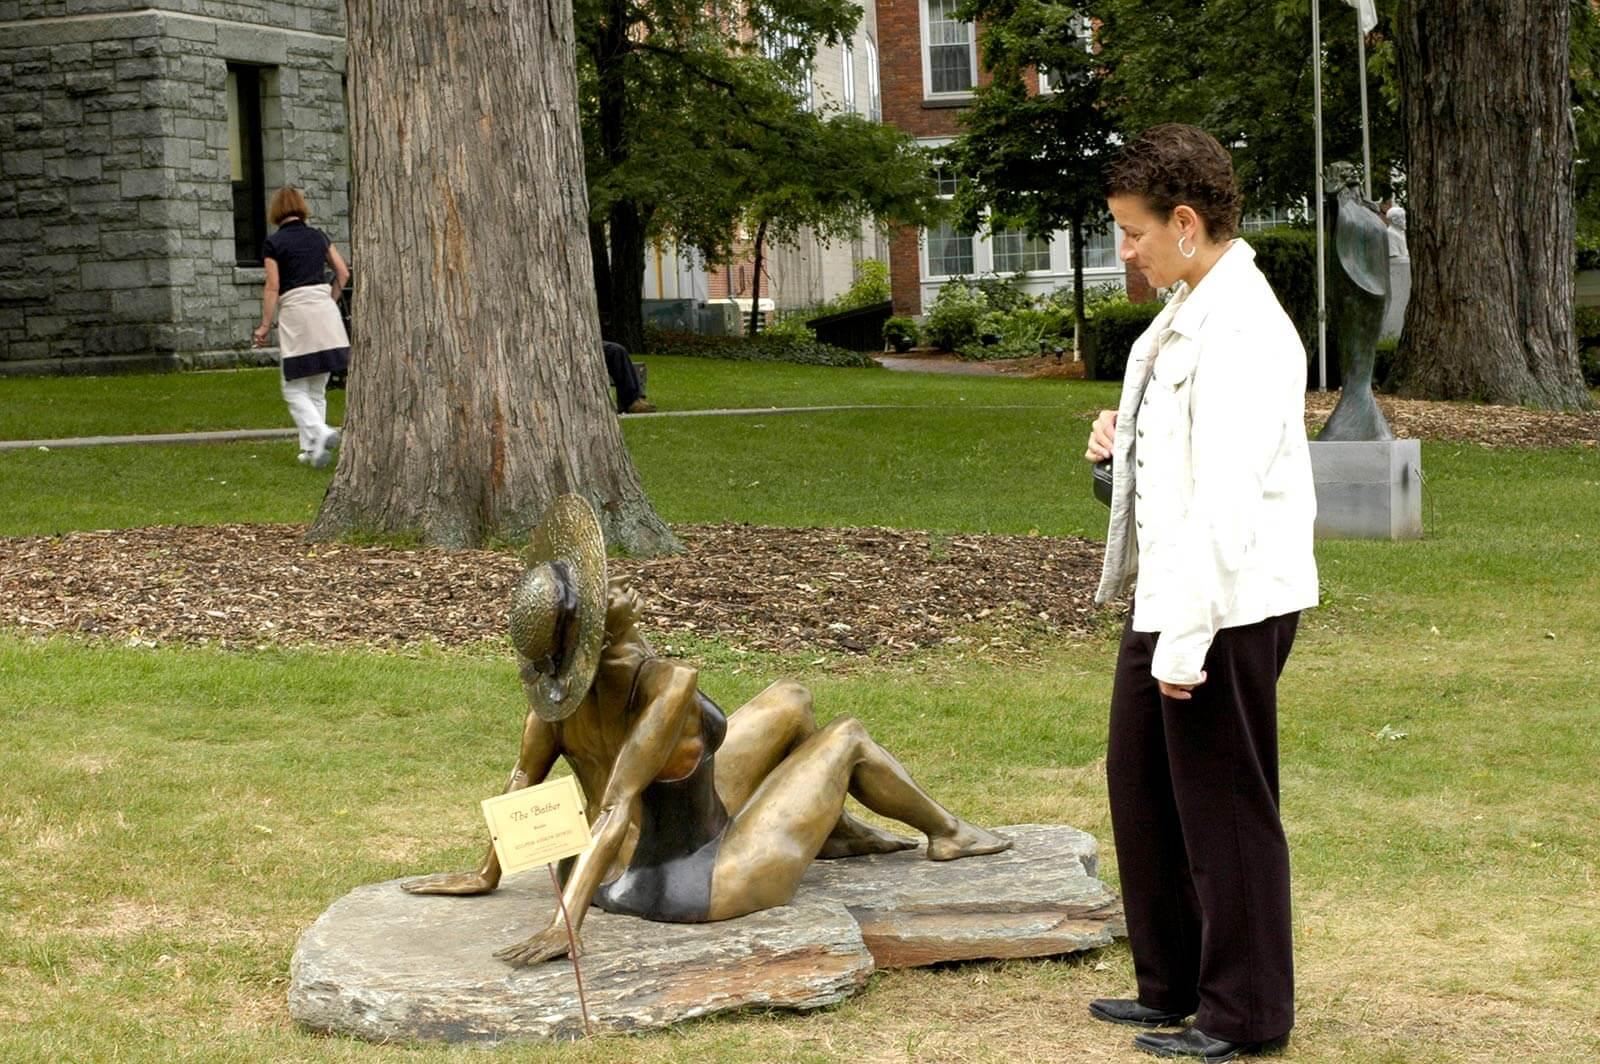 Bronze Bather sculpture by sculptor Andrew deVries in Northhampton MA